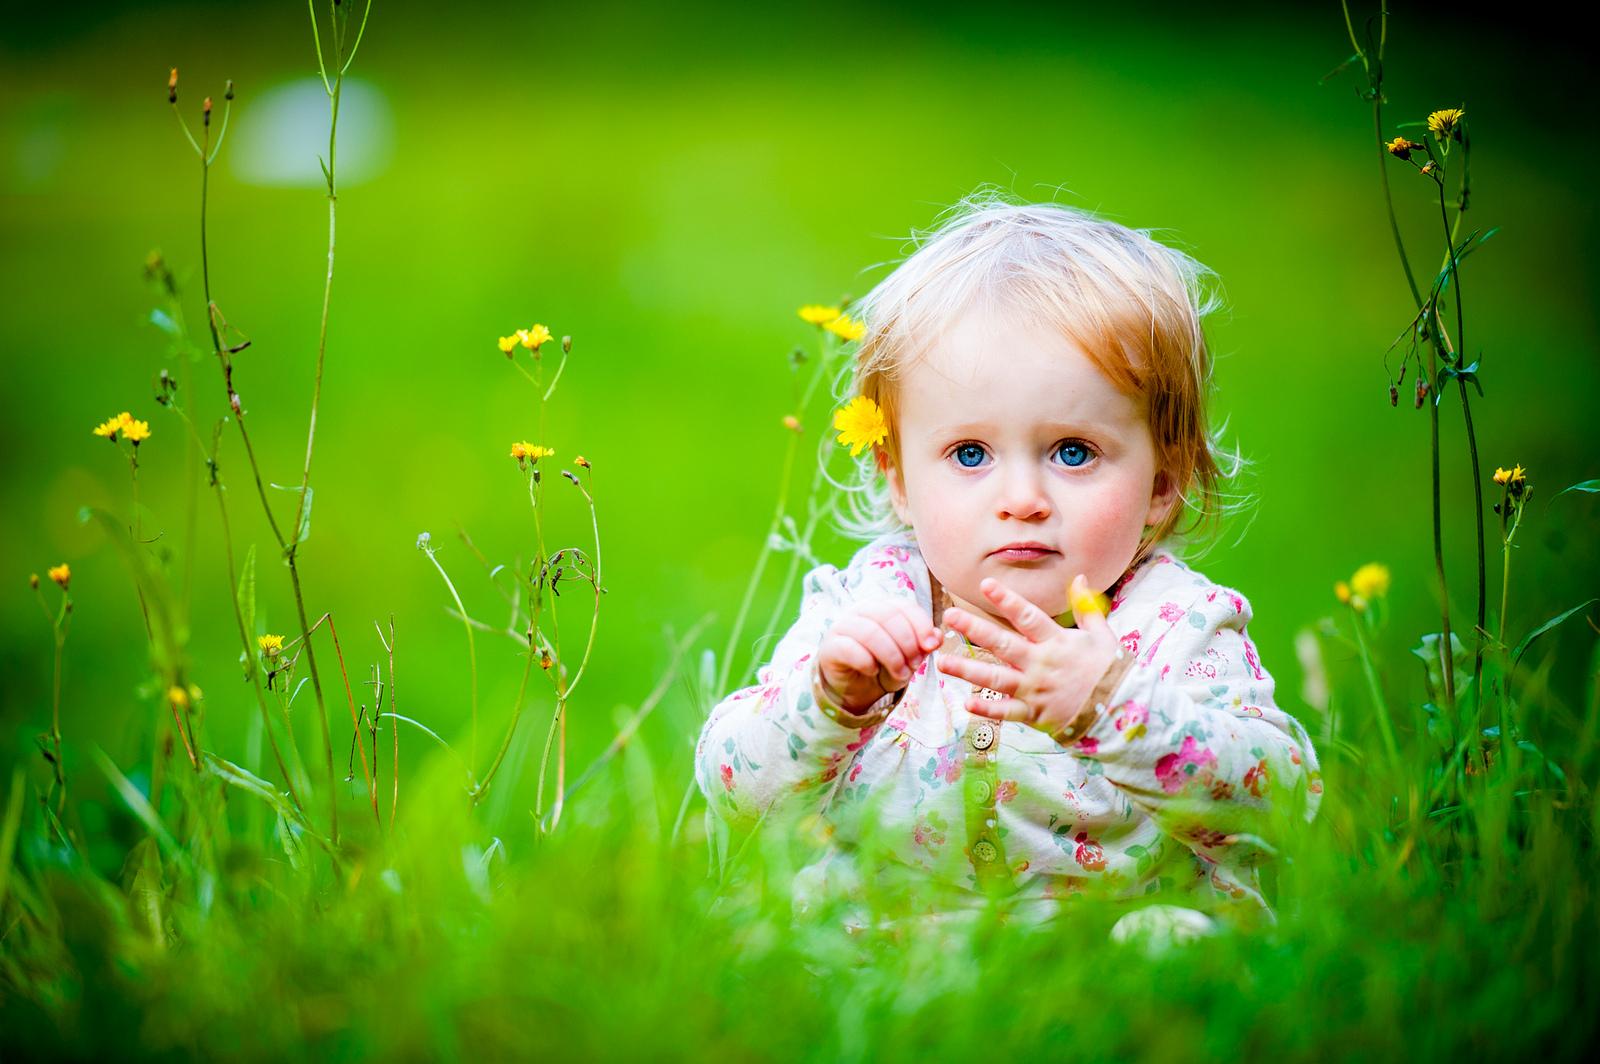 Sweet baby pictures wallpapers wallpapersafari - Sweet baby wallpaper free download ...